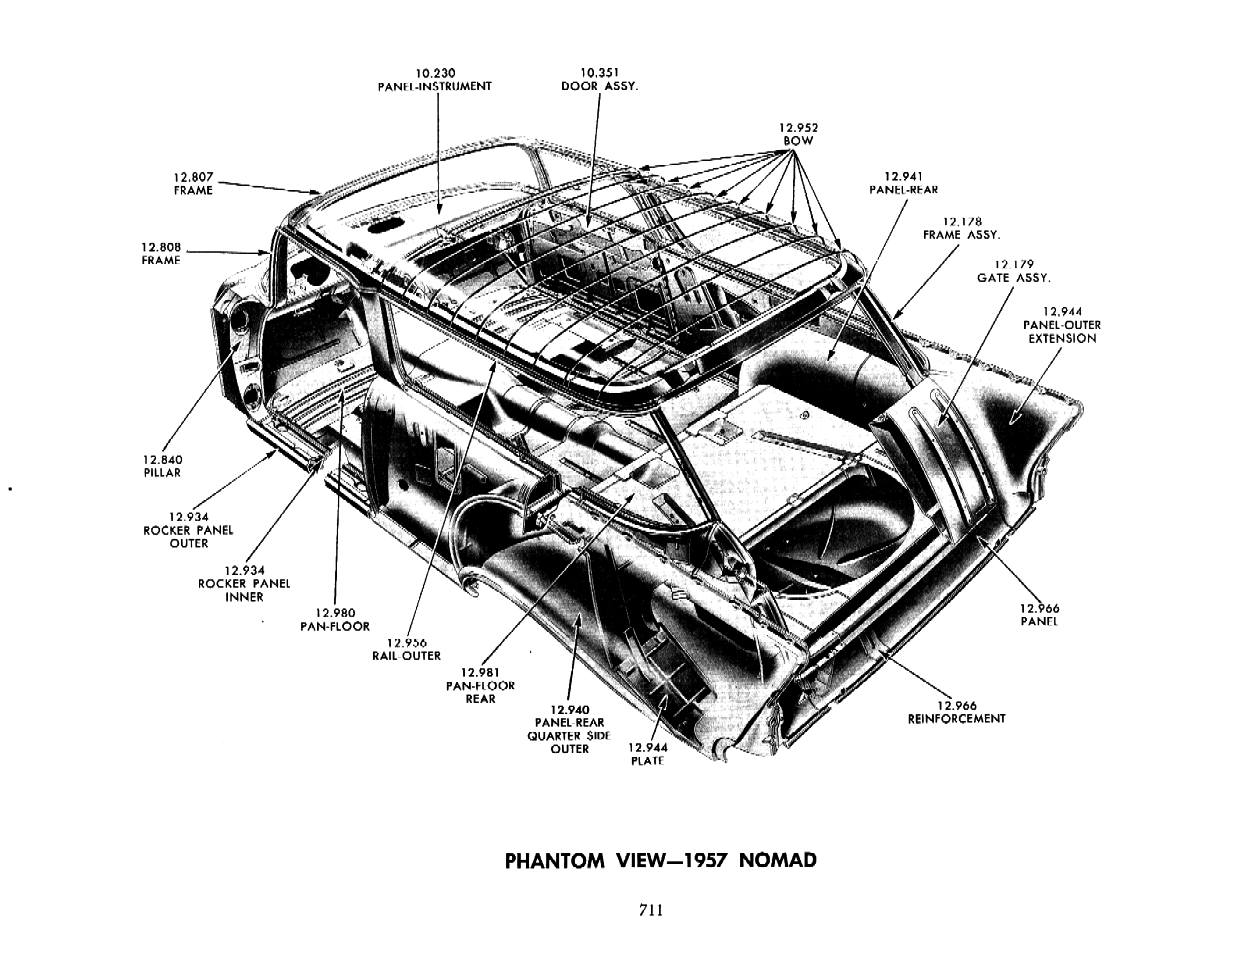 57 Chevy Cars Needing Engine